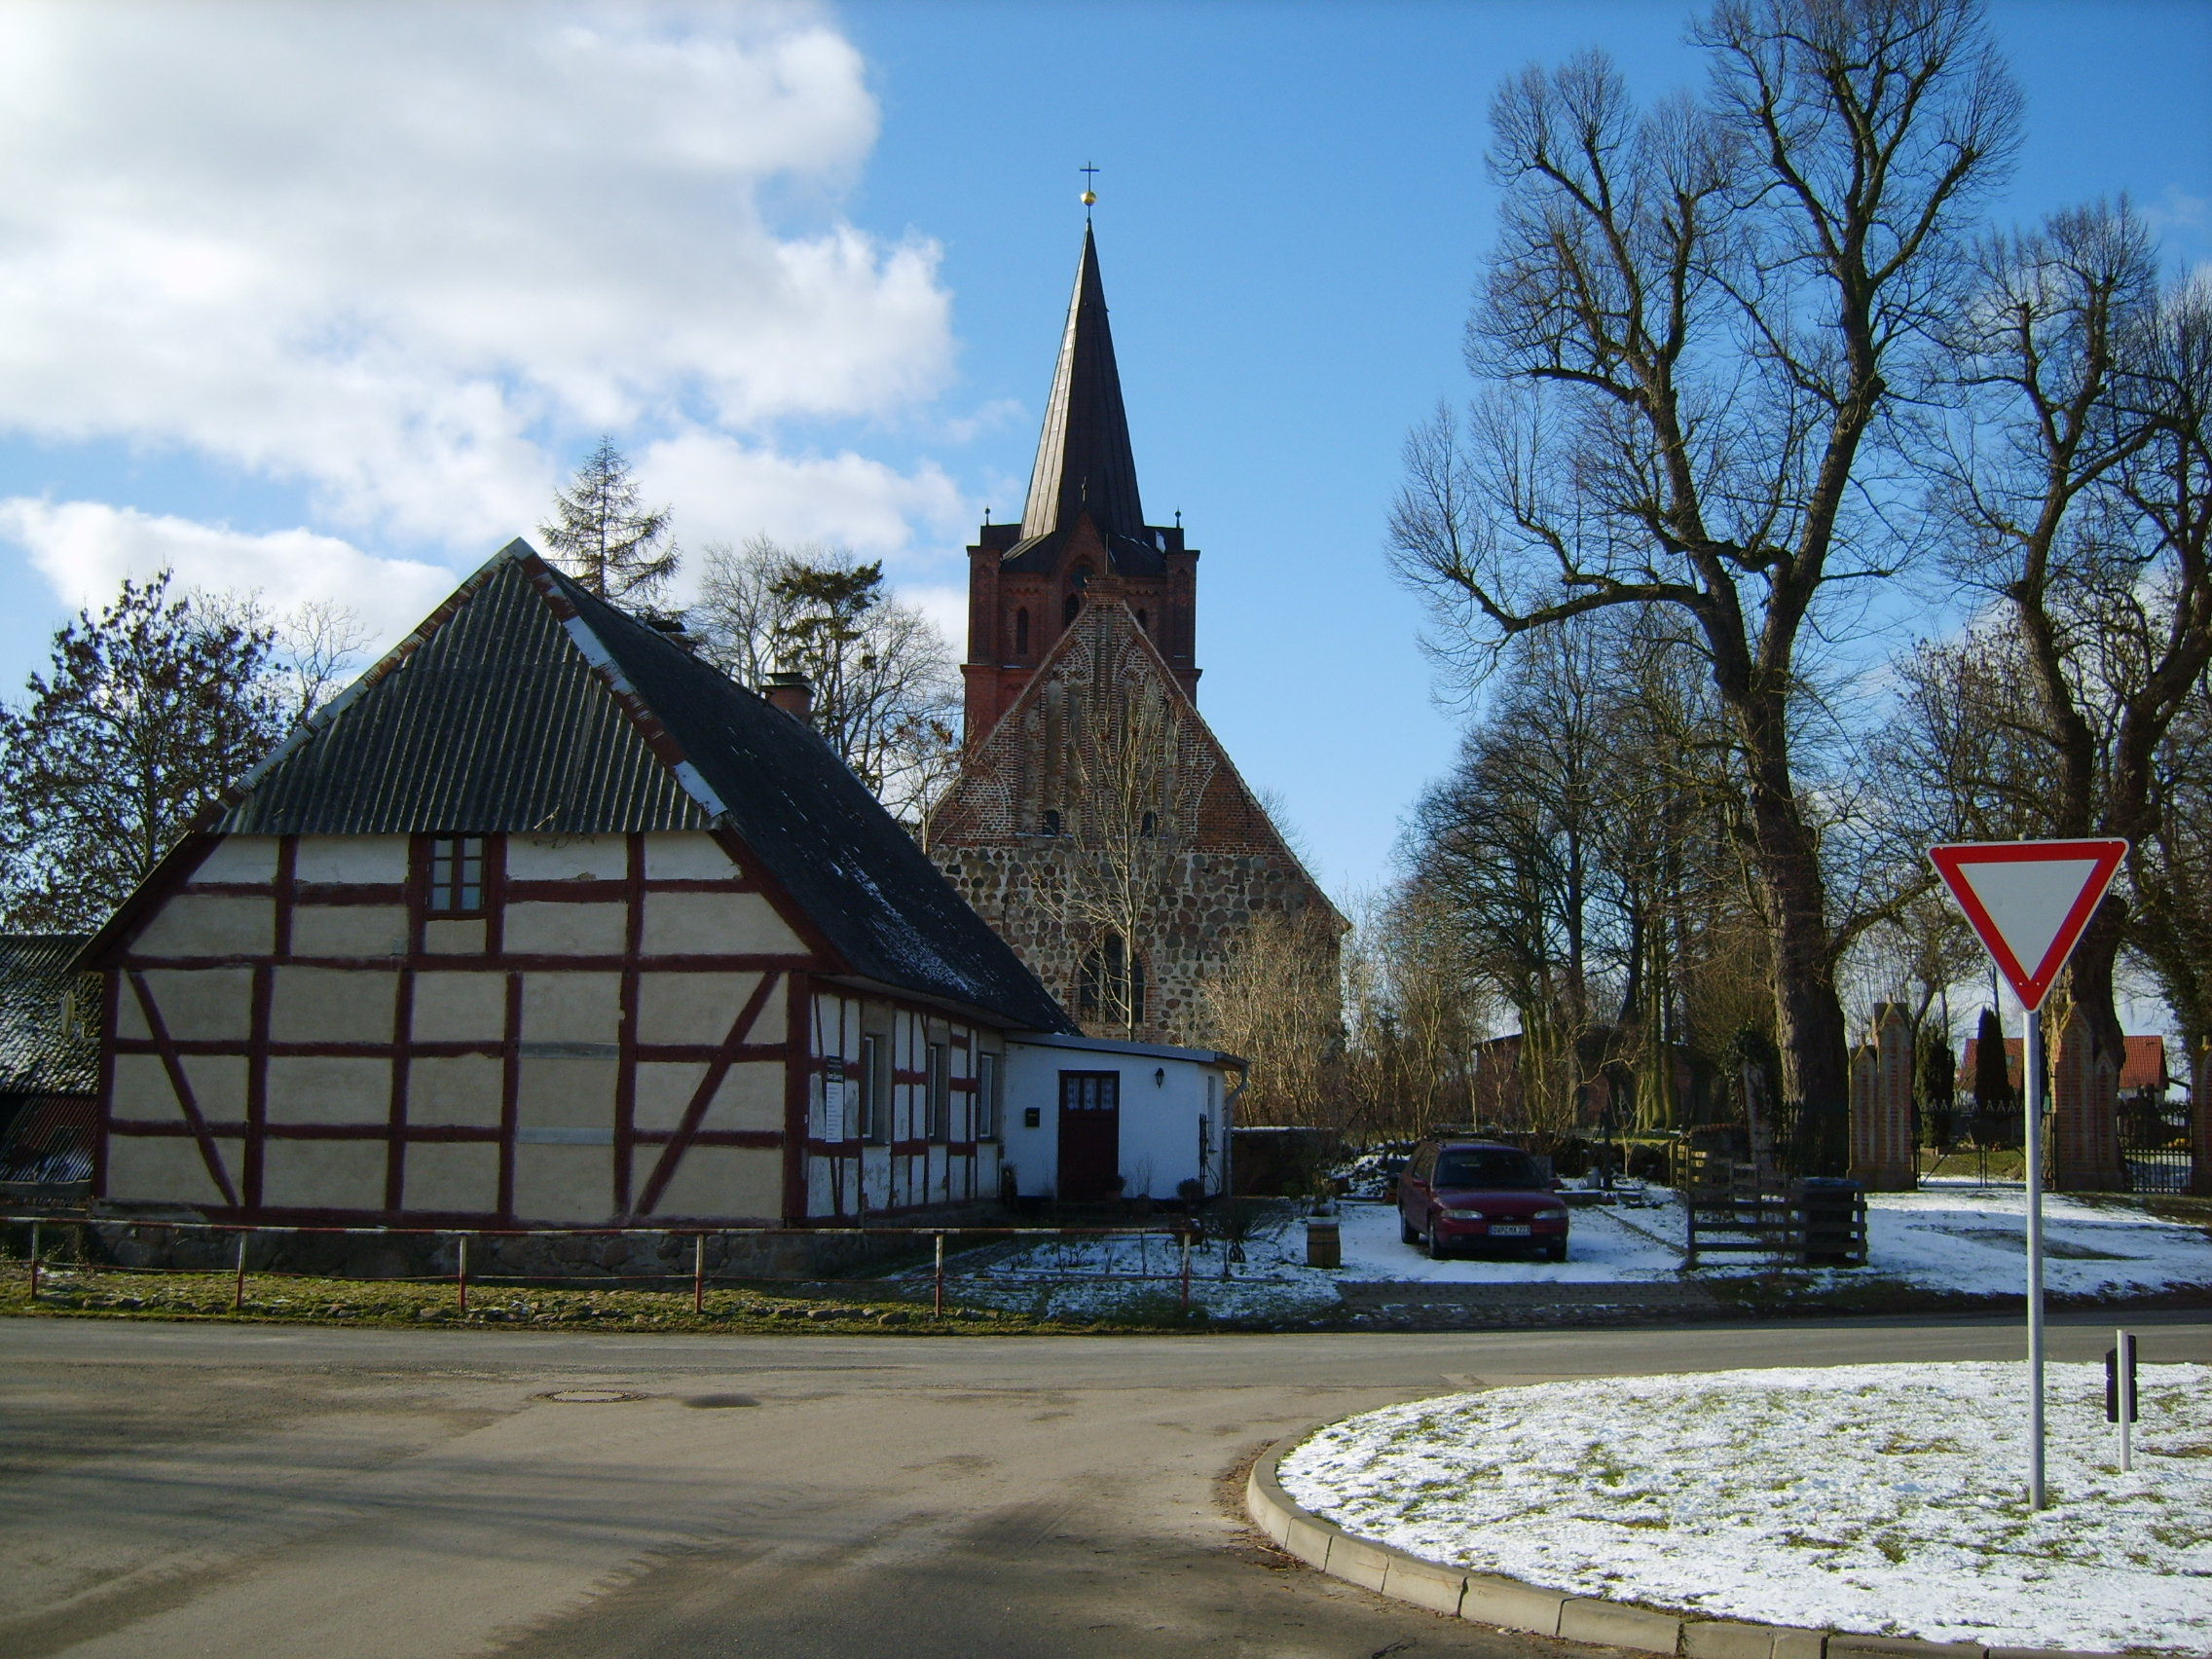 Ranzin-Dorfplatz-0702l-047.JPG